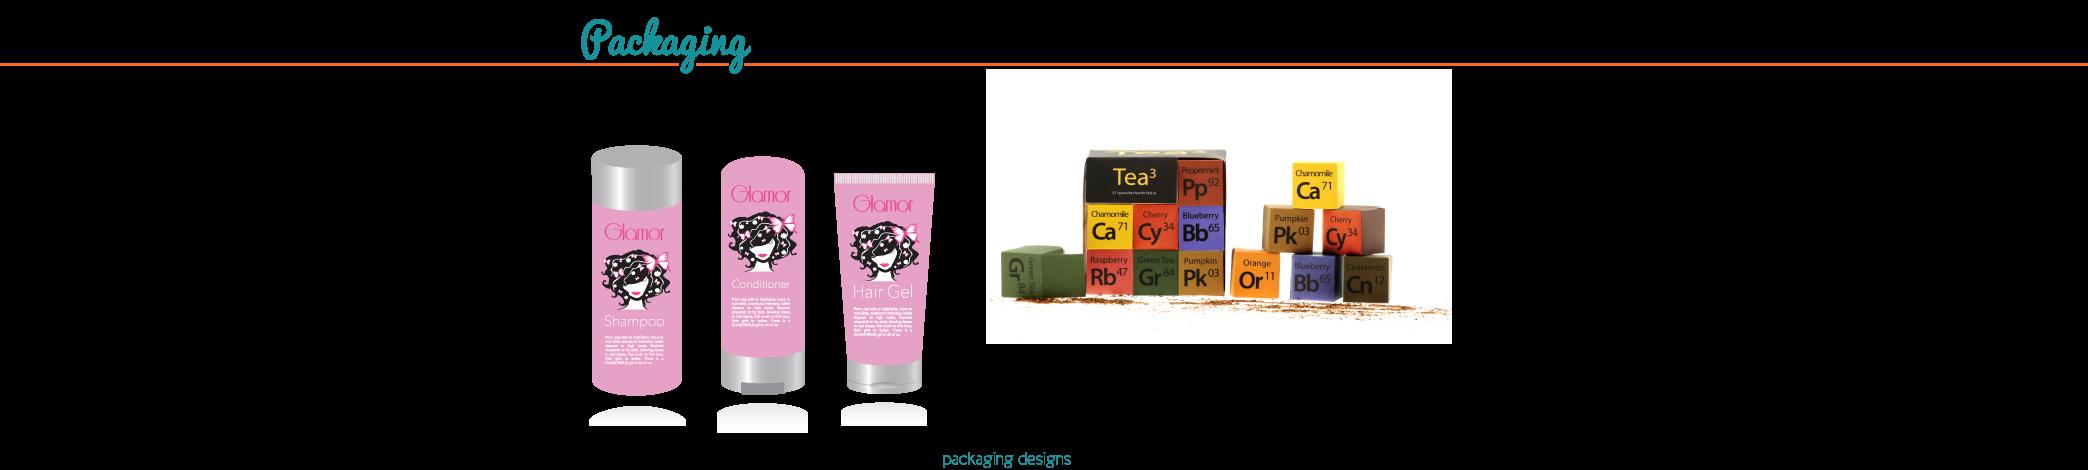 Packaging by Grundy Designs | www.grundydesigns.com | Facebook | Twitter #grundydesigns